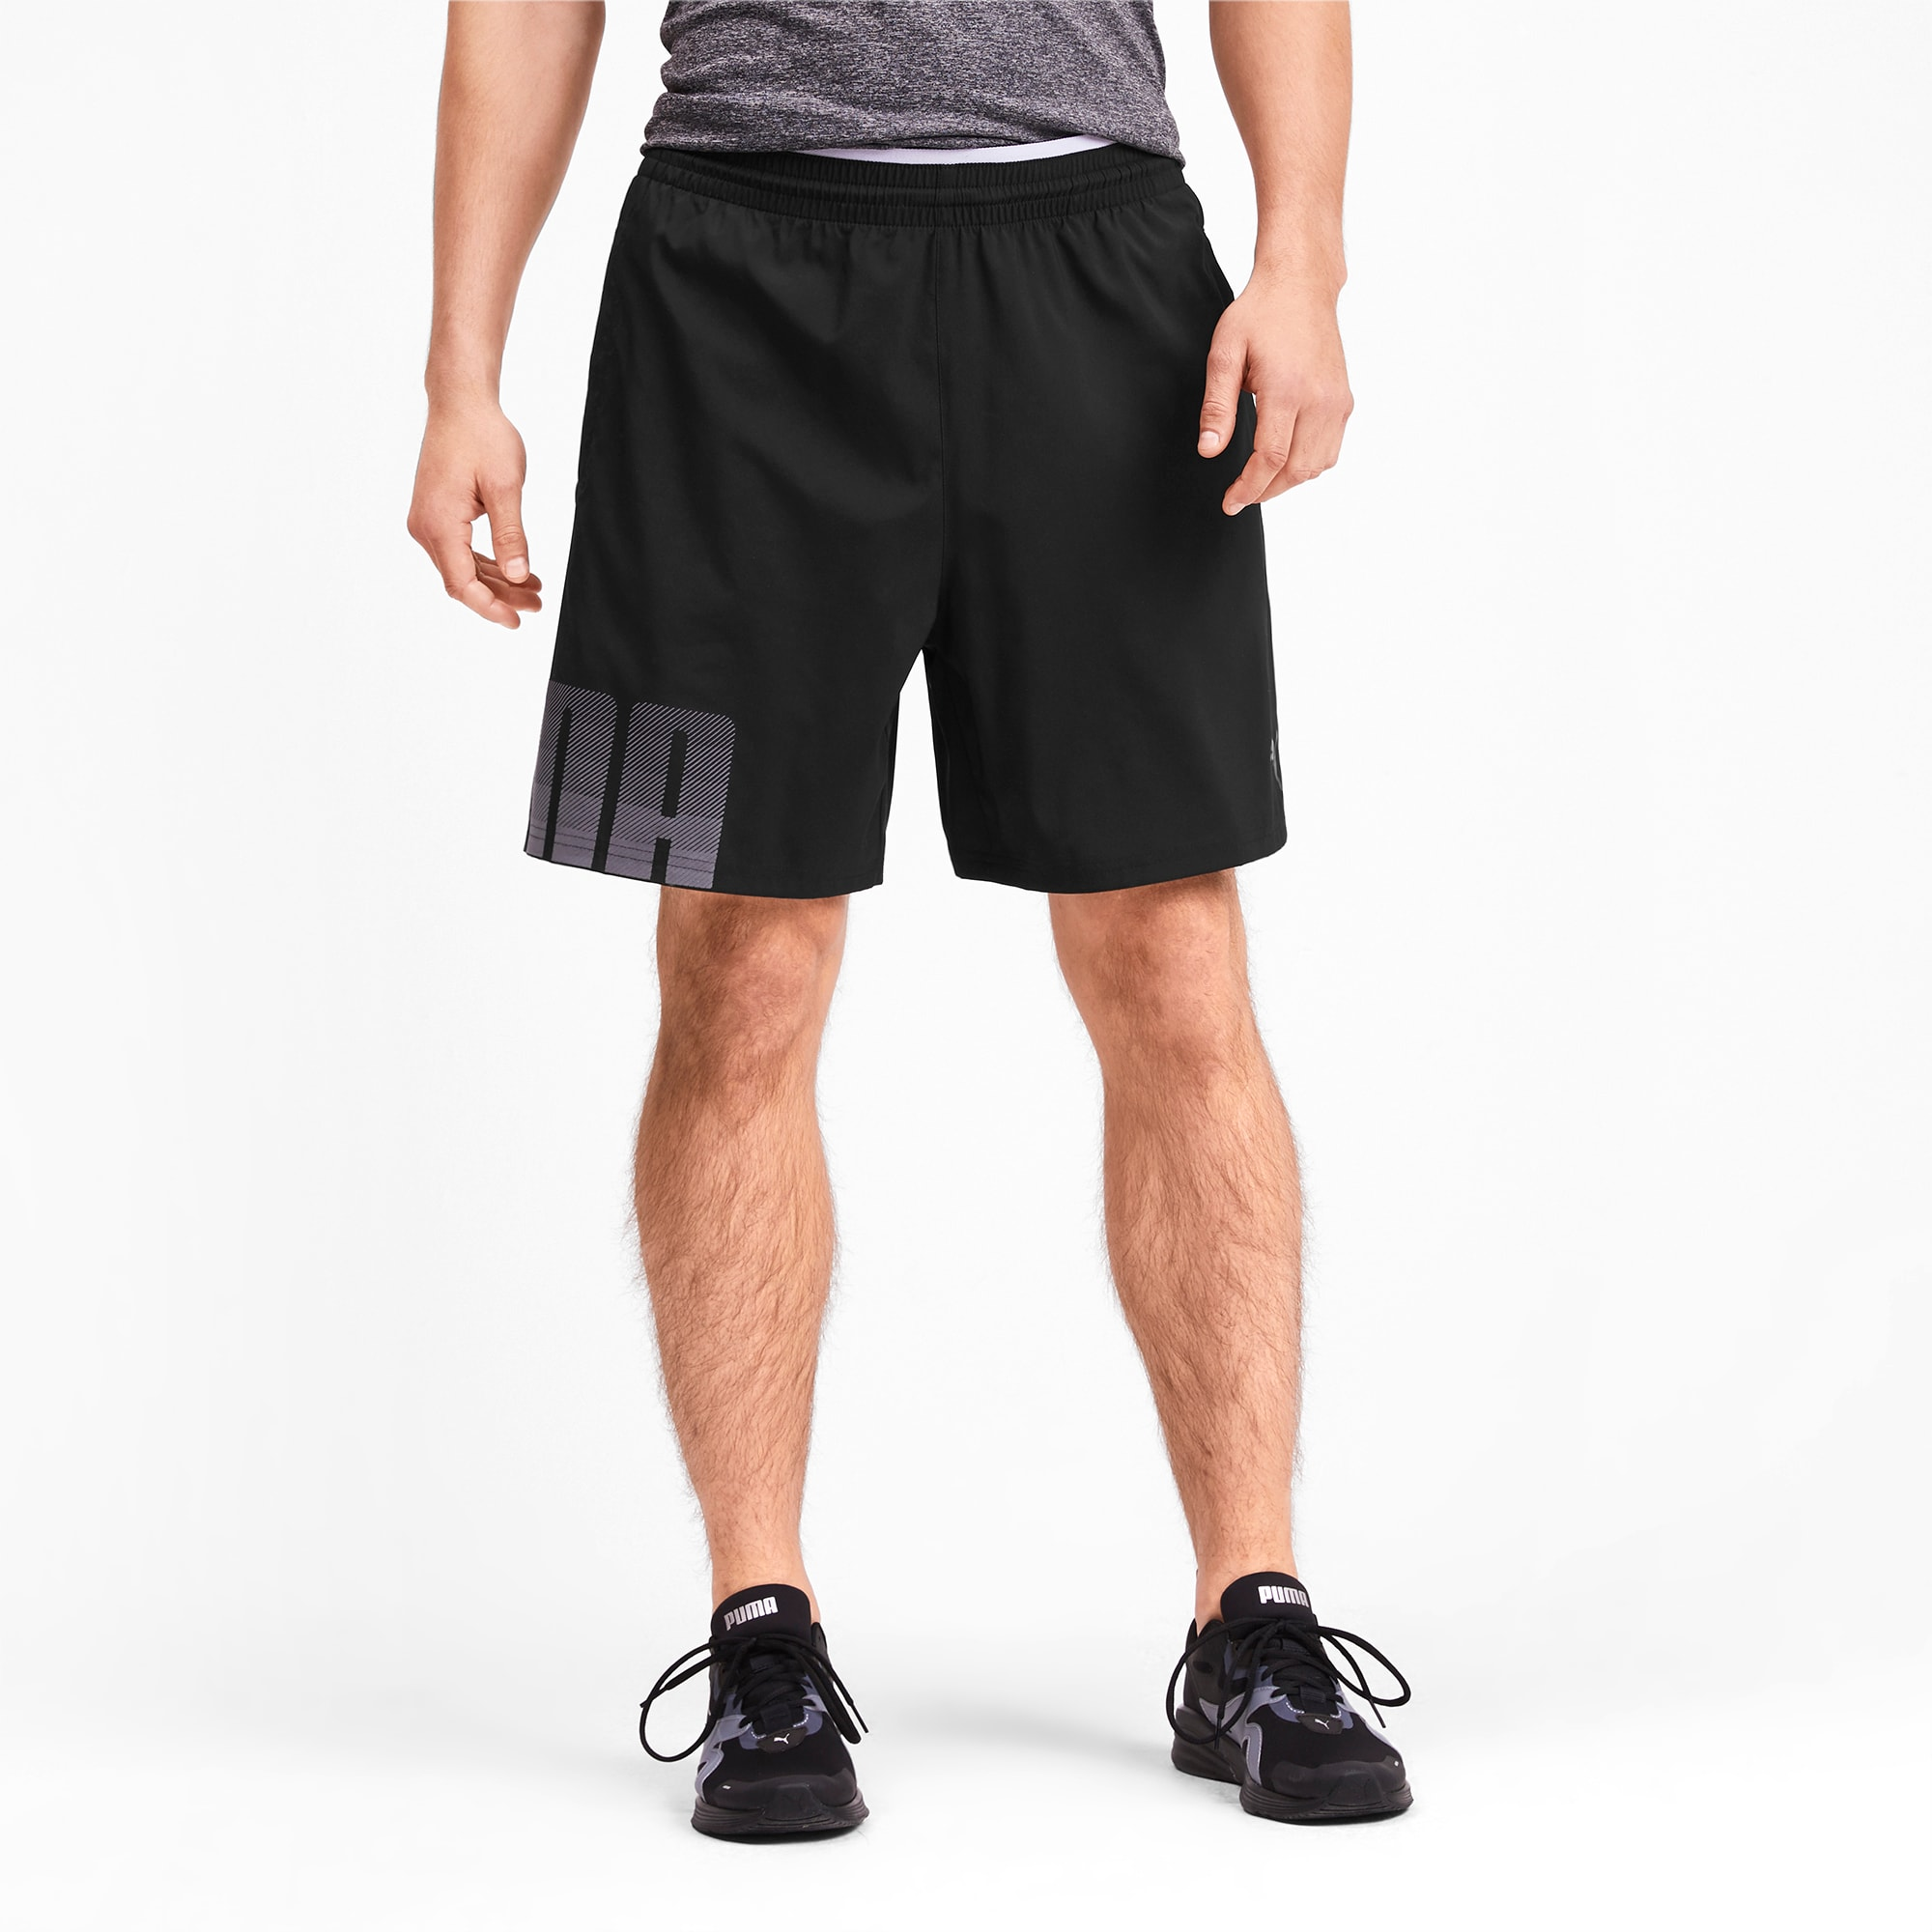 Size Small Puma Mens Black Woven Shorts NEW